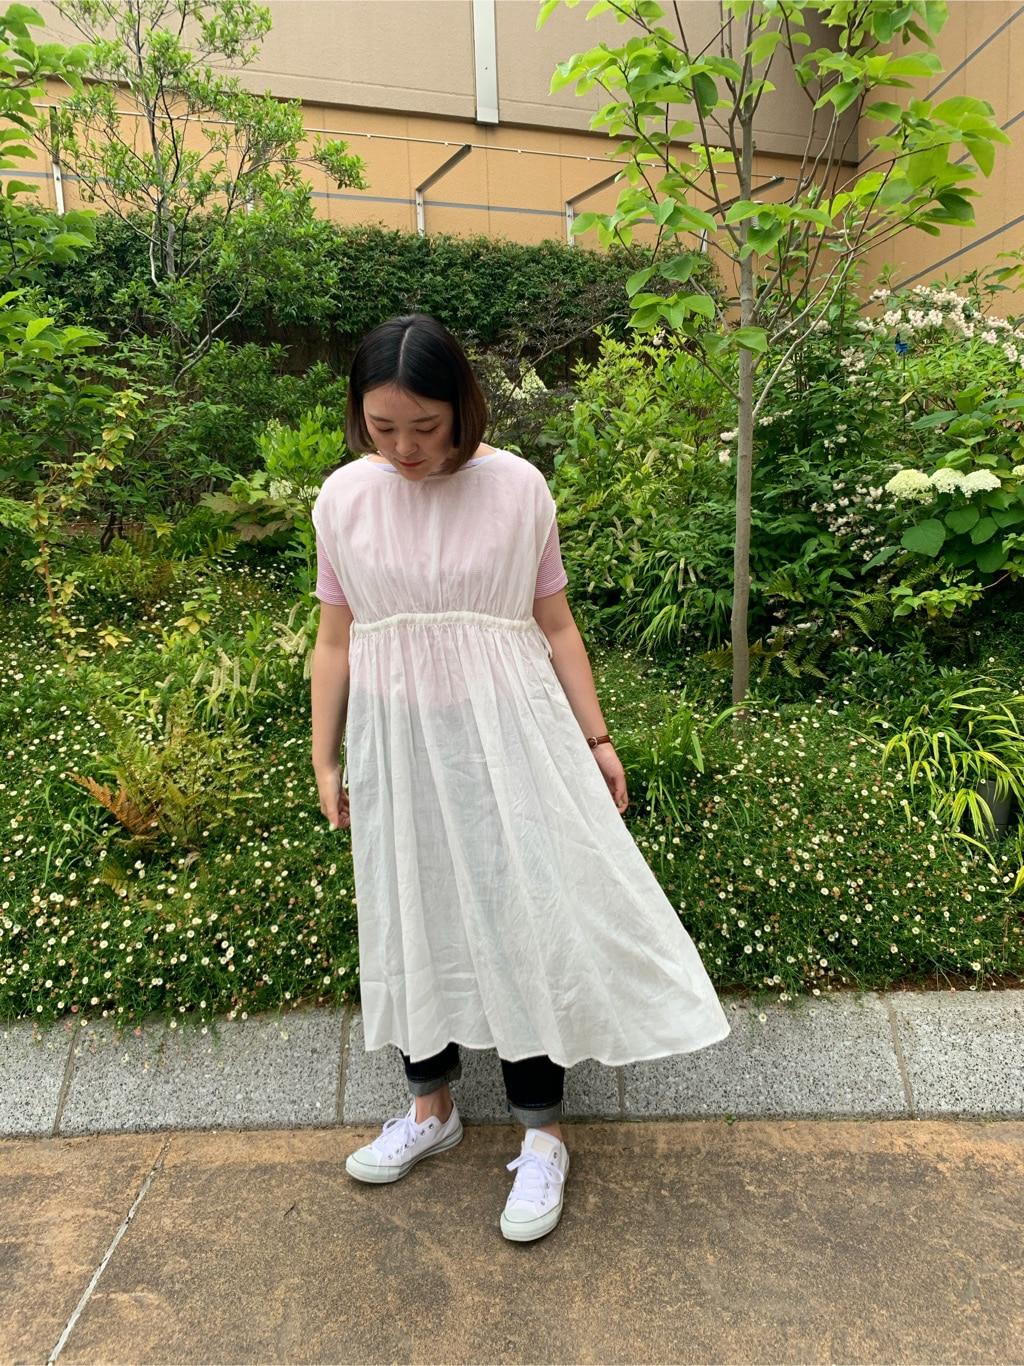 bulle de savon なんばシティ 身長:166cm 2020.06.16